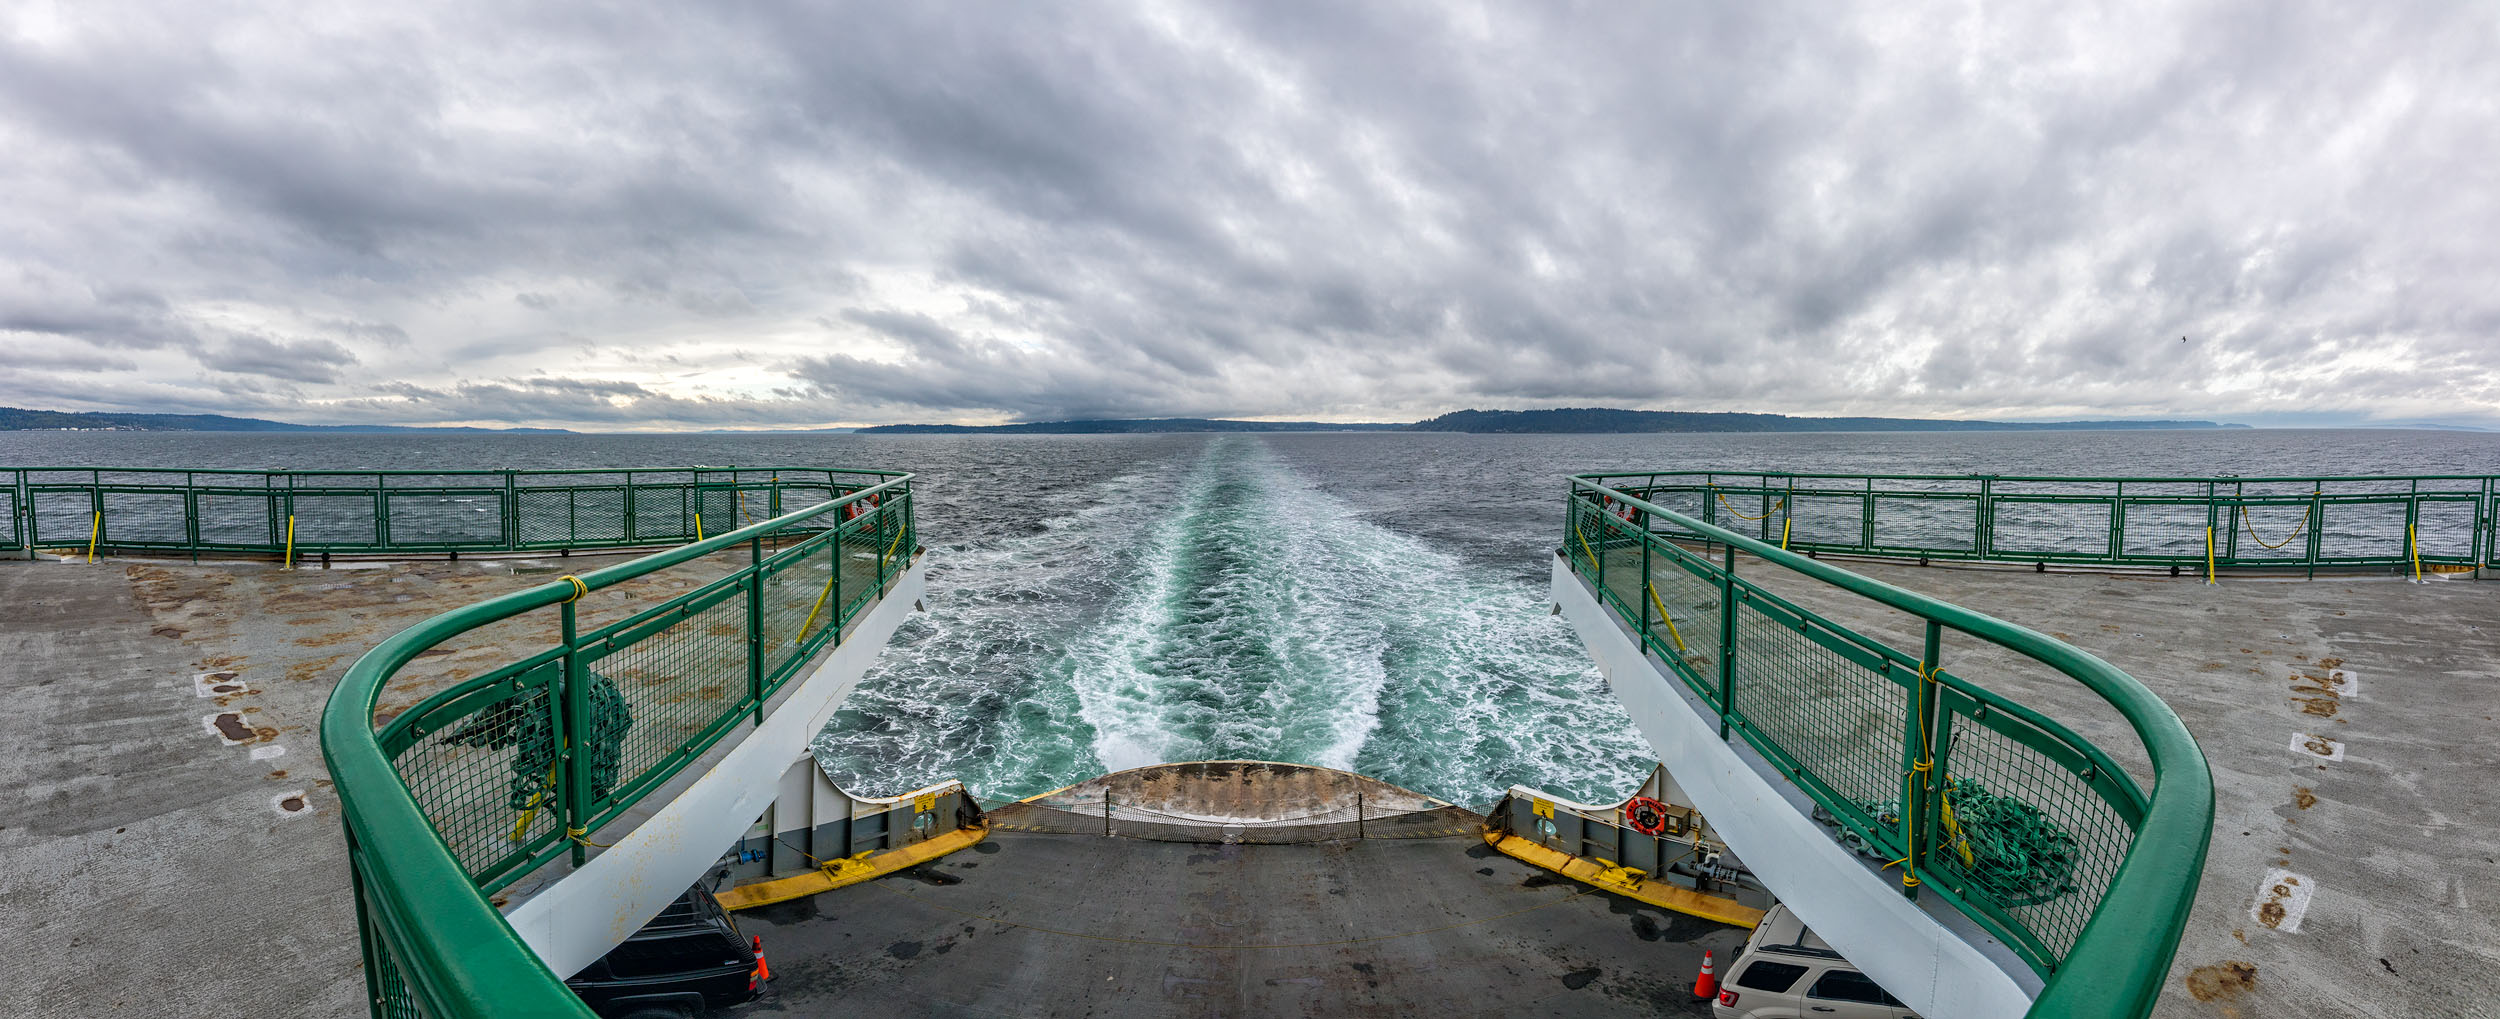 Ferry Wake 2500.jpg